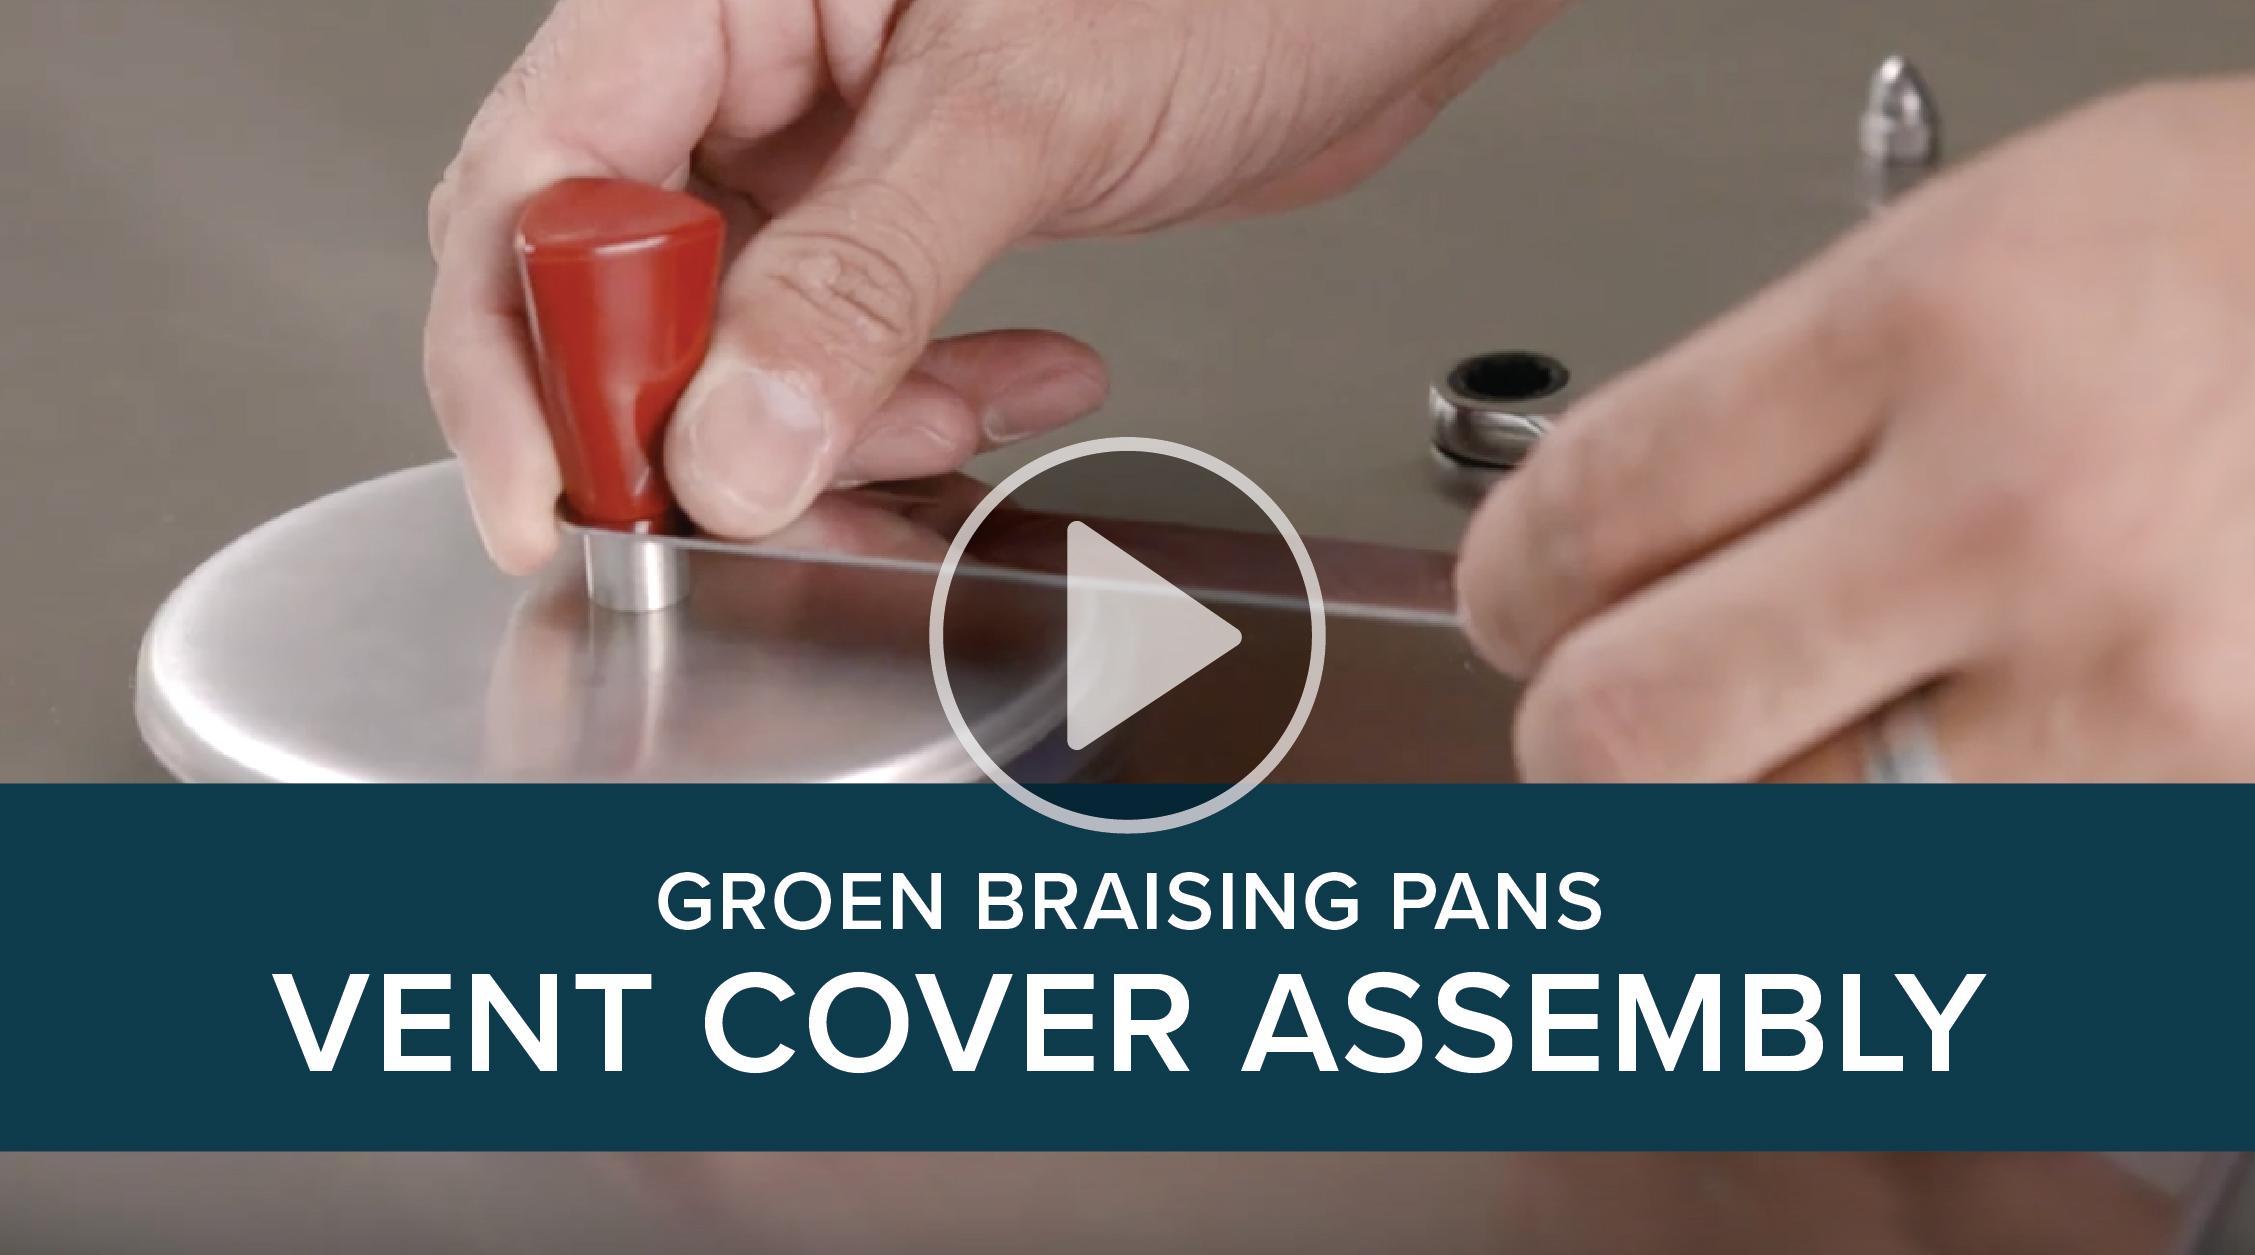 Groen Vent Cover Assemply Braising Pans